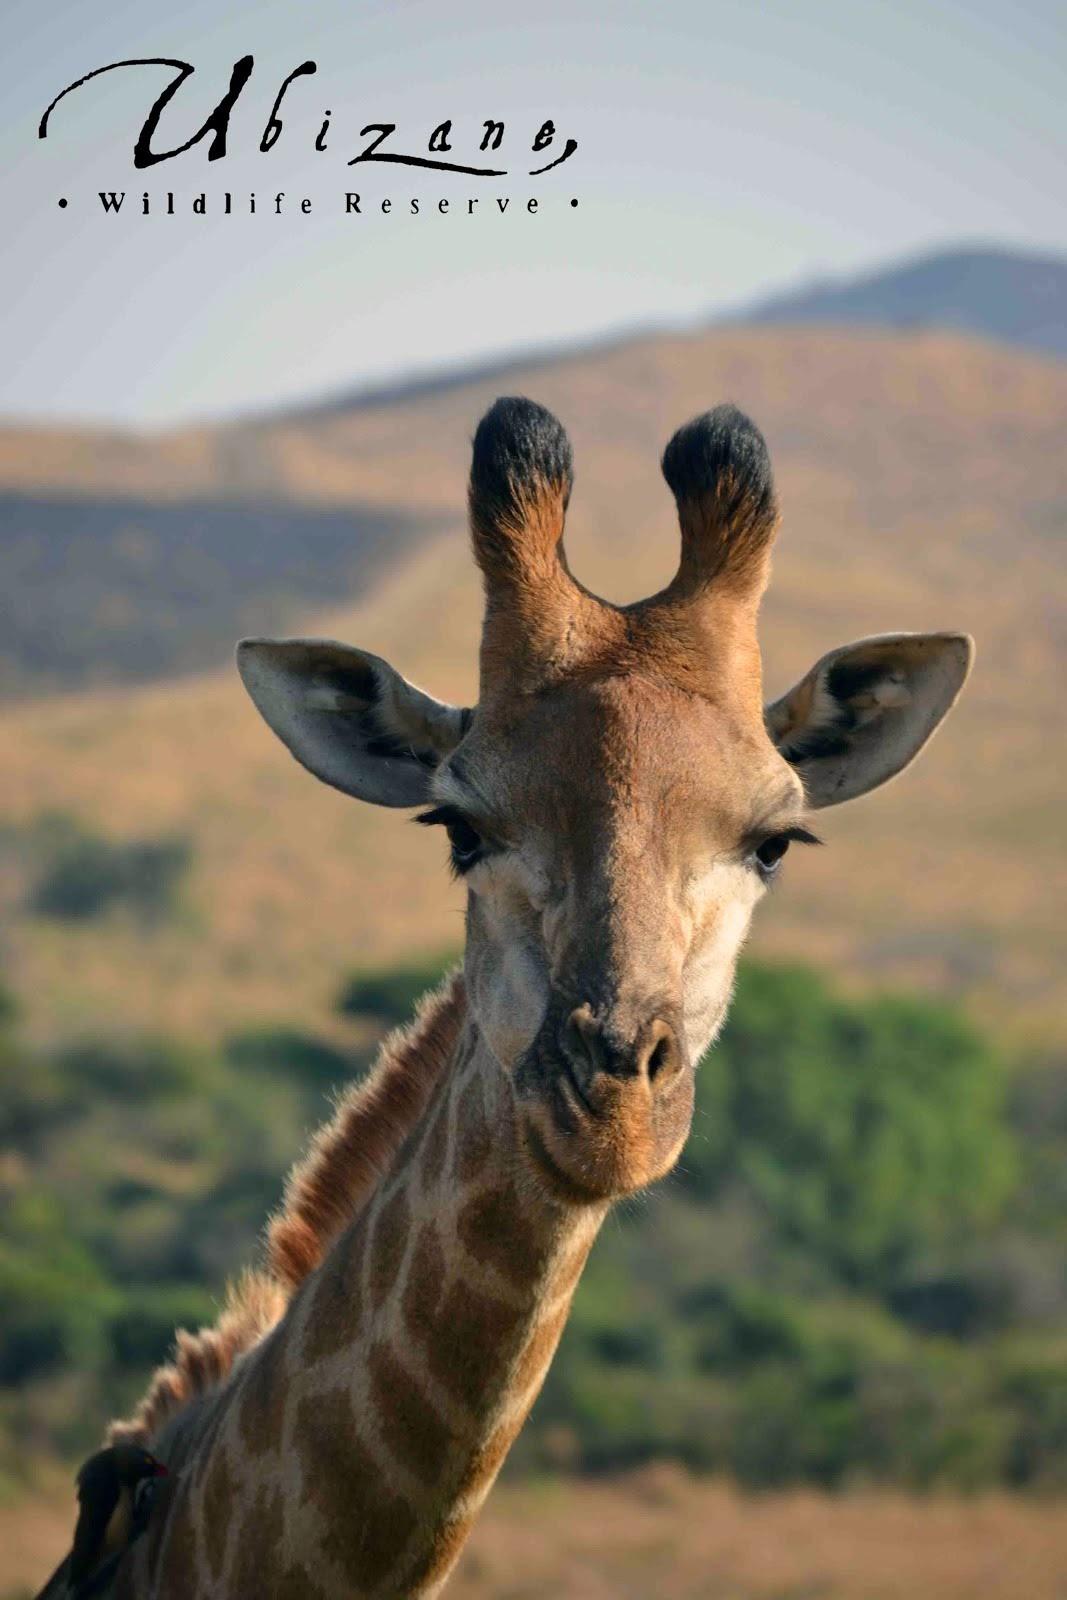 Ubizane Wildlife Reserve's Giraffe